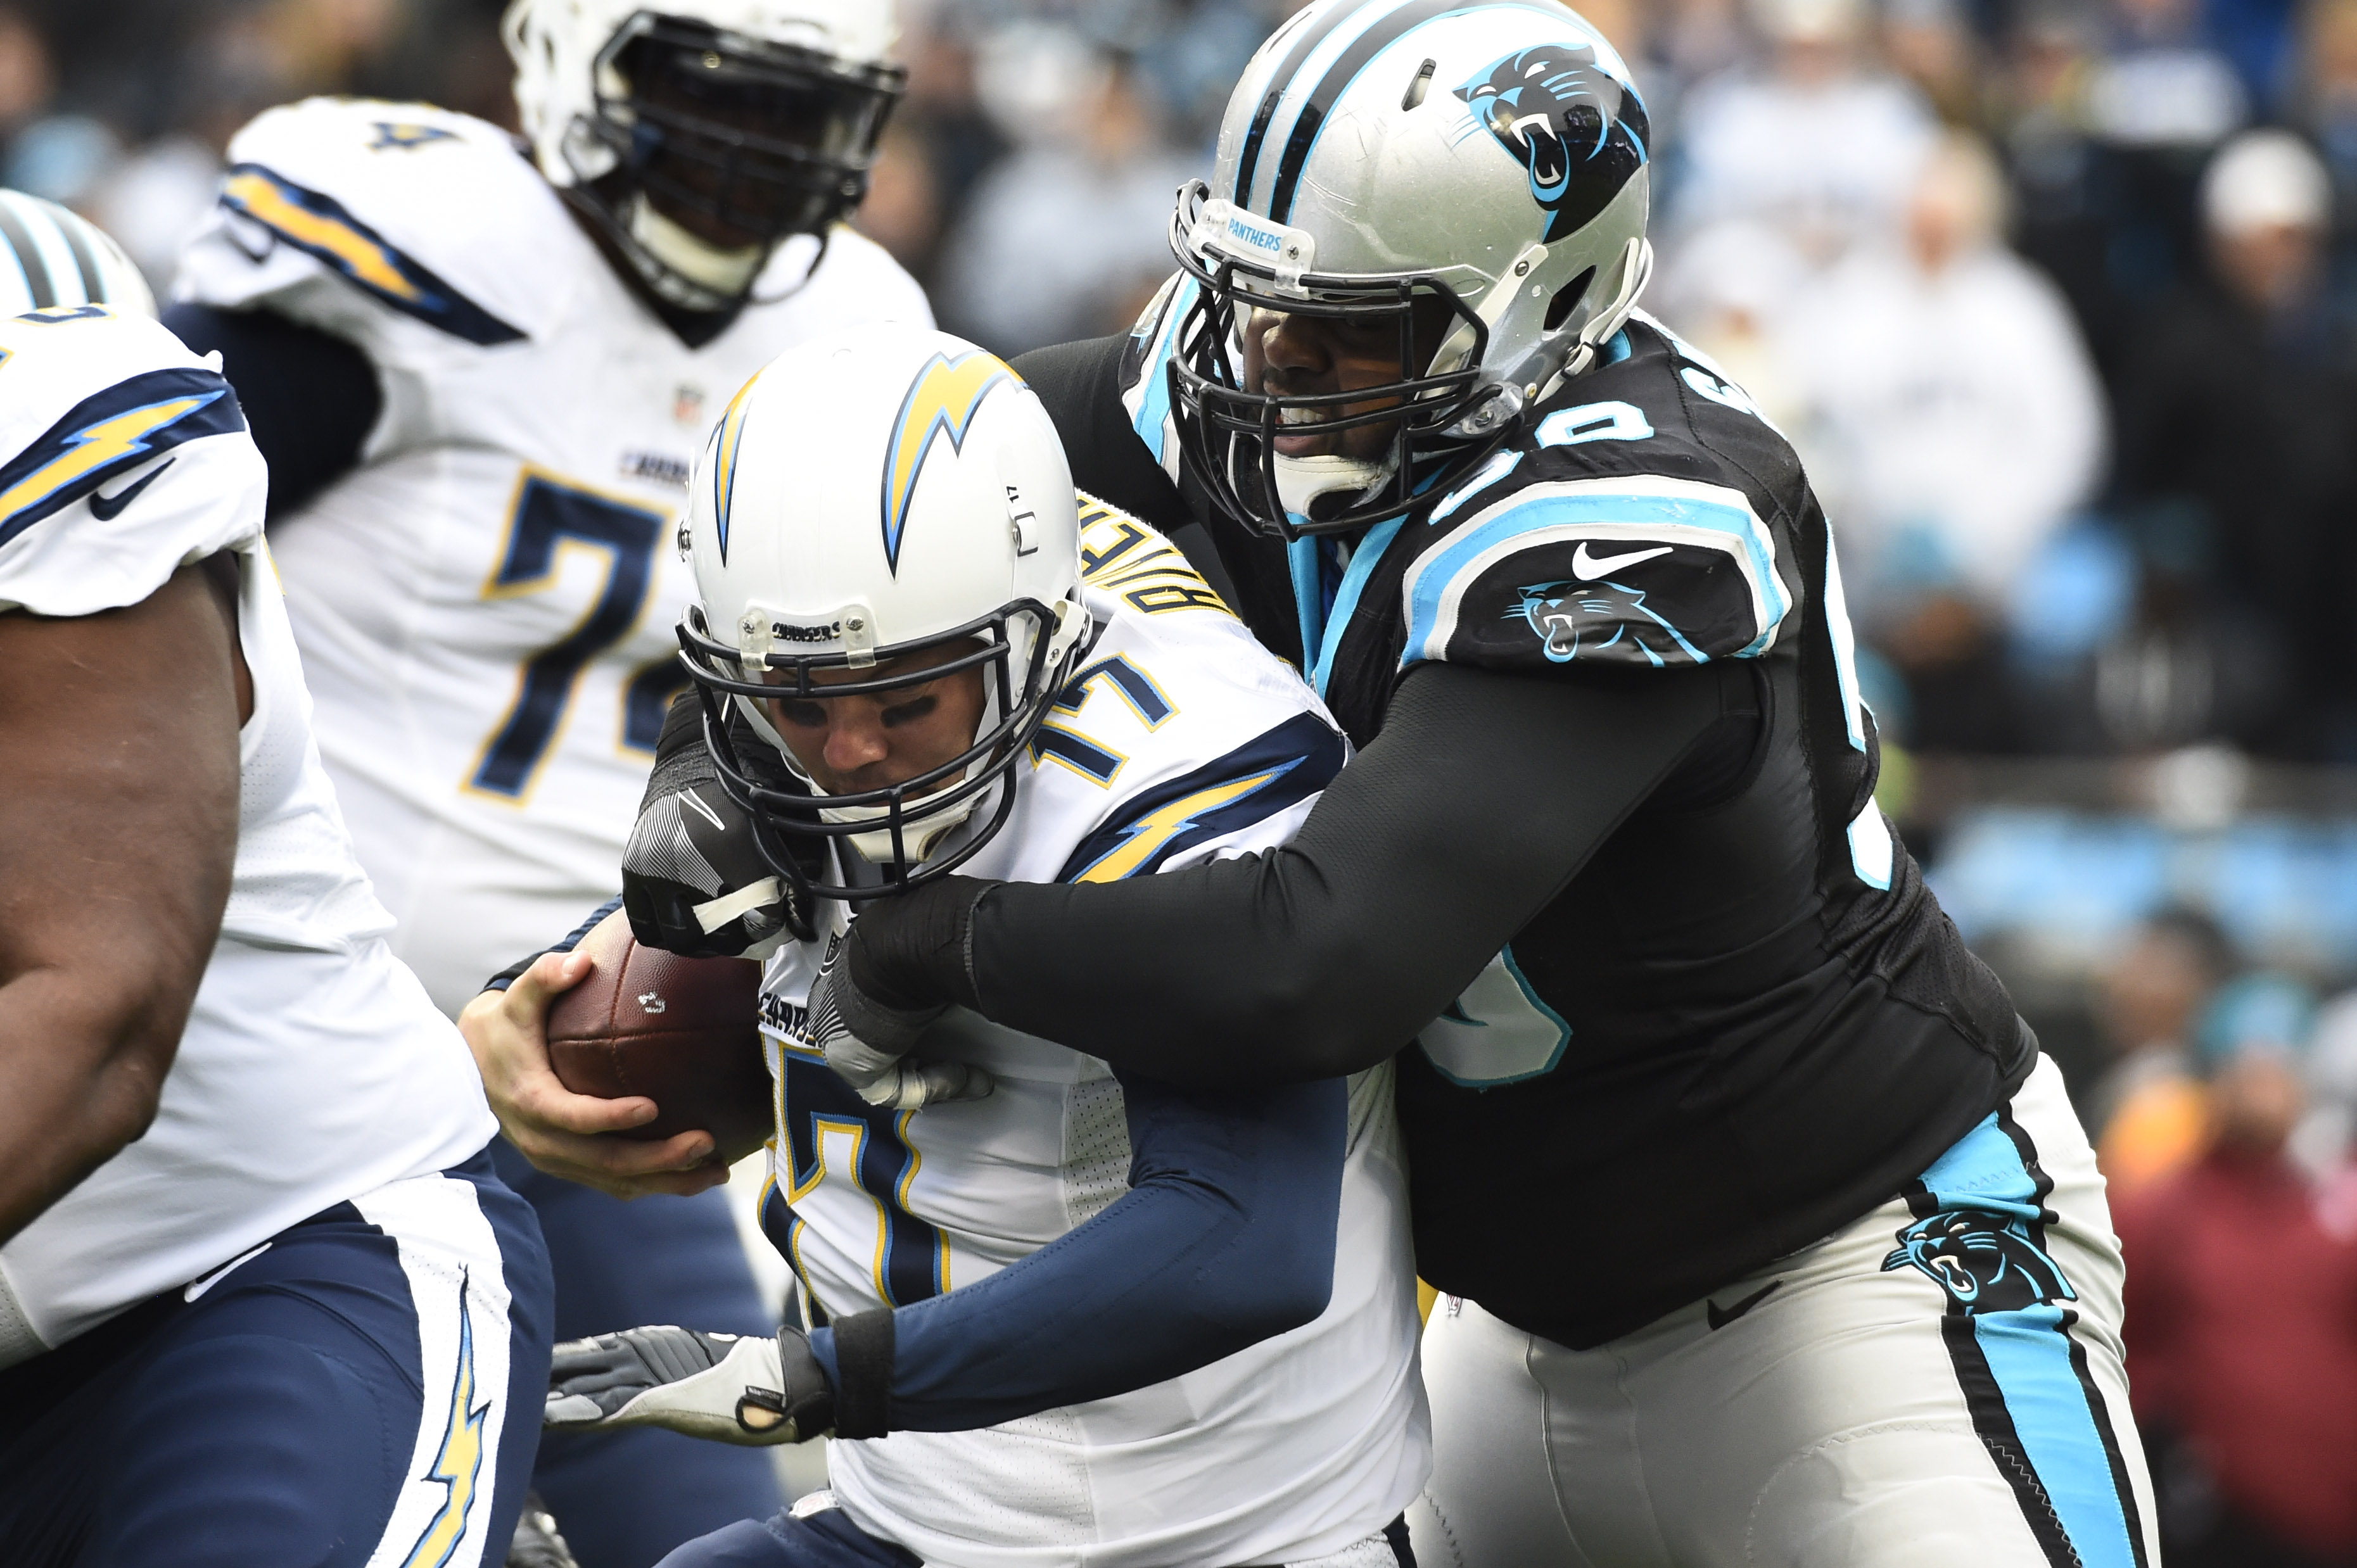 Carolina Panthers: Kawann Short Contract Solidifies Future Plans